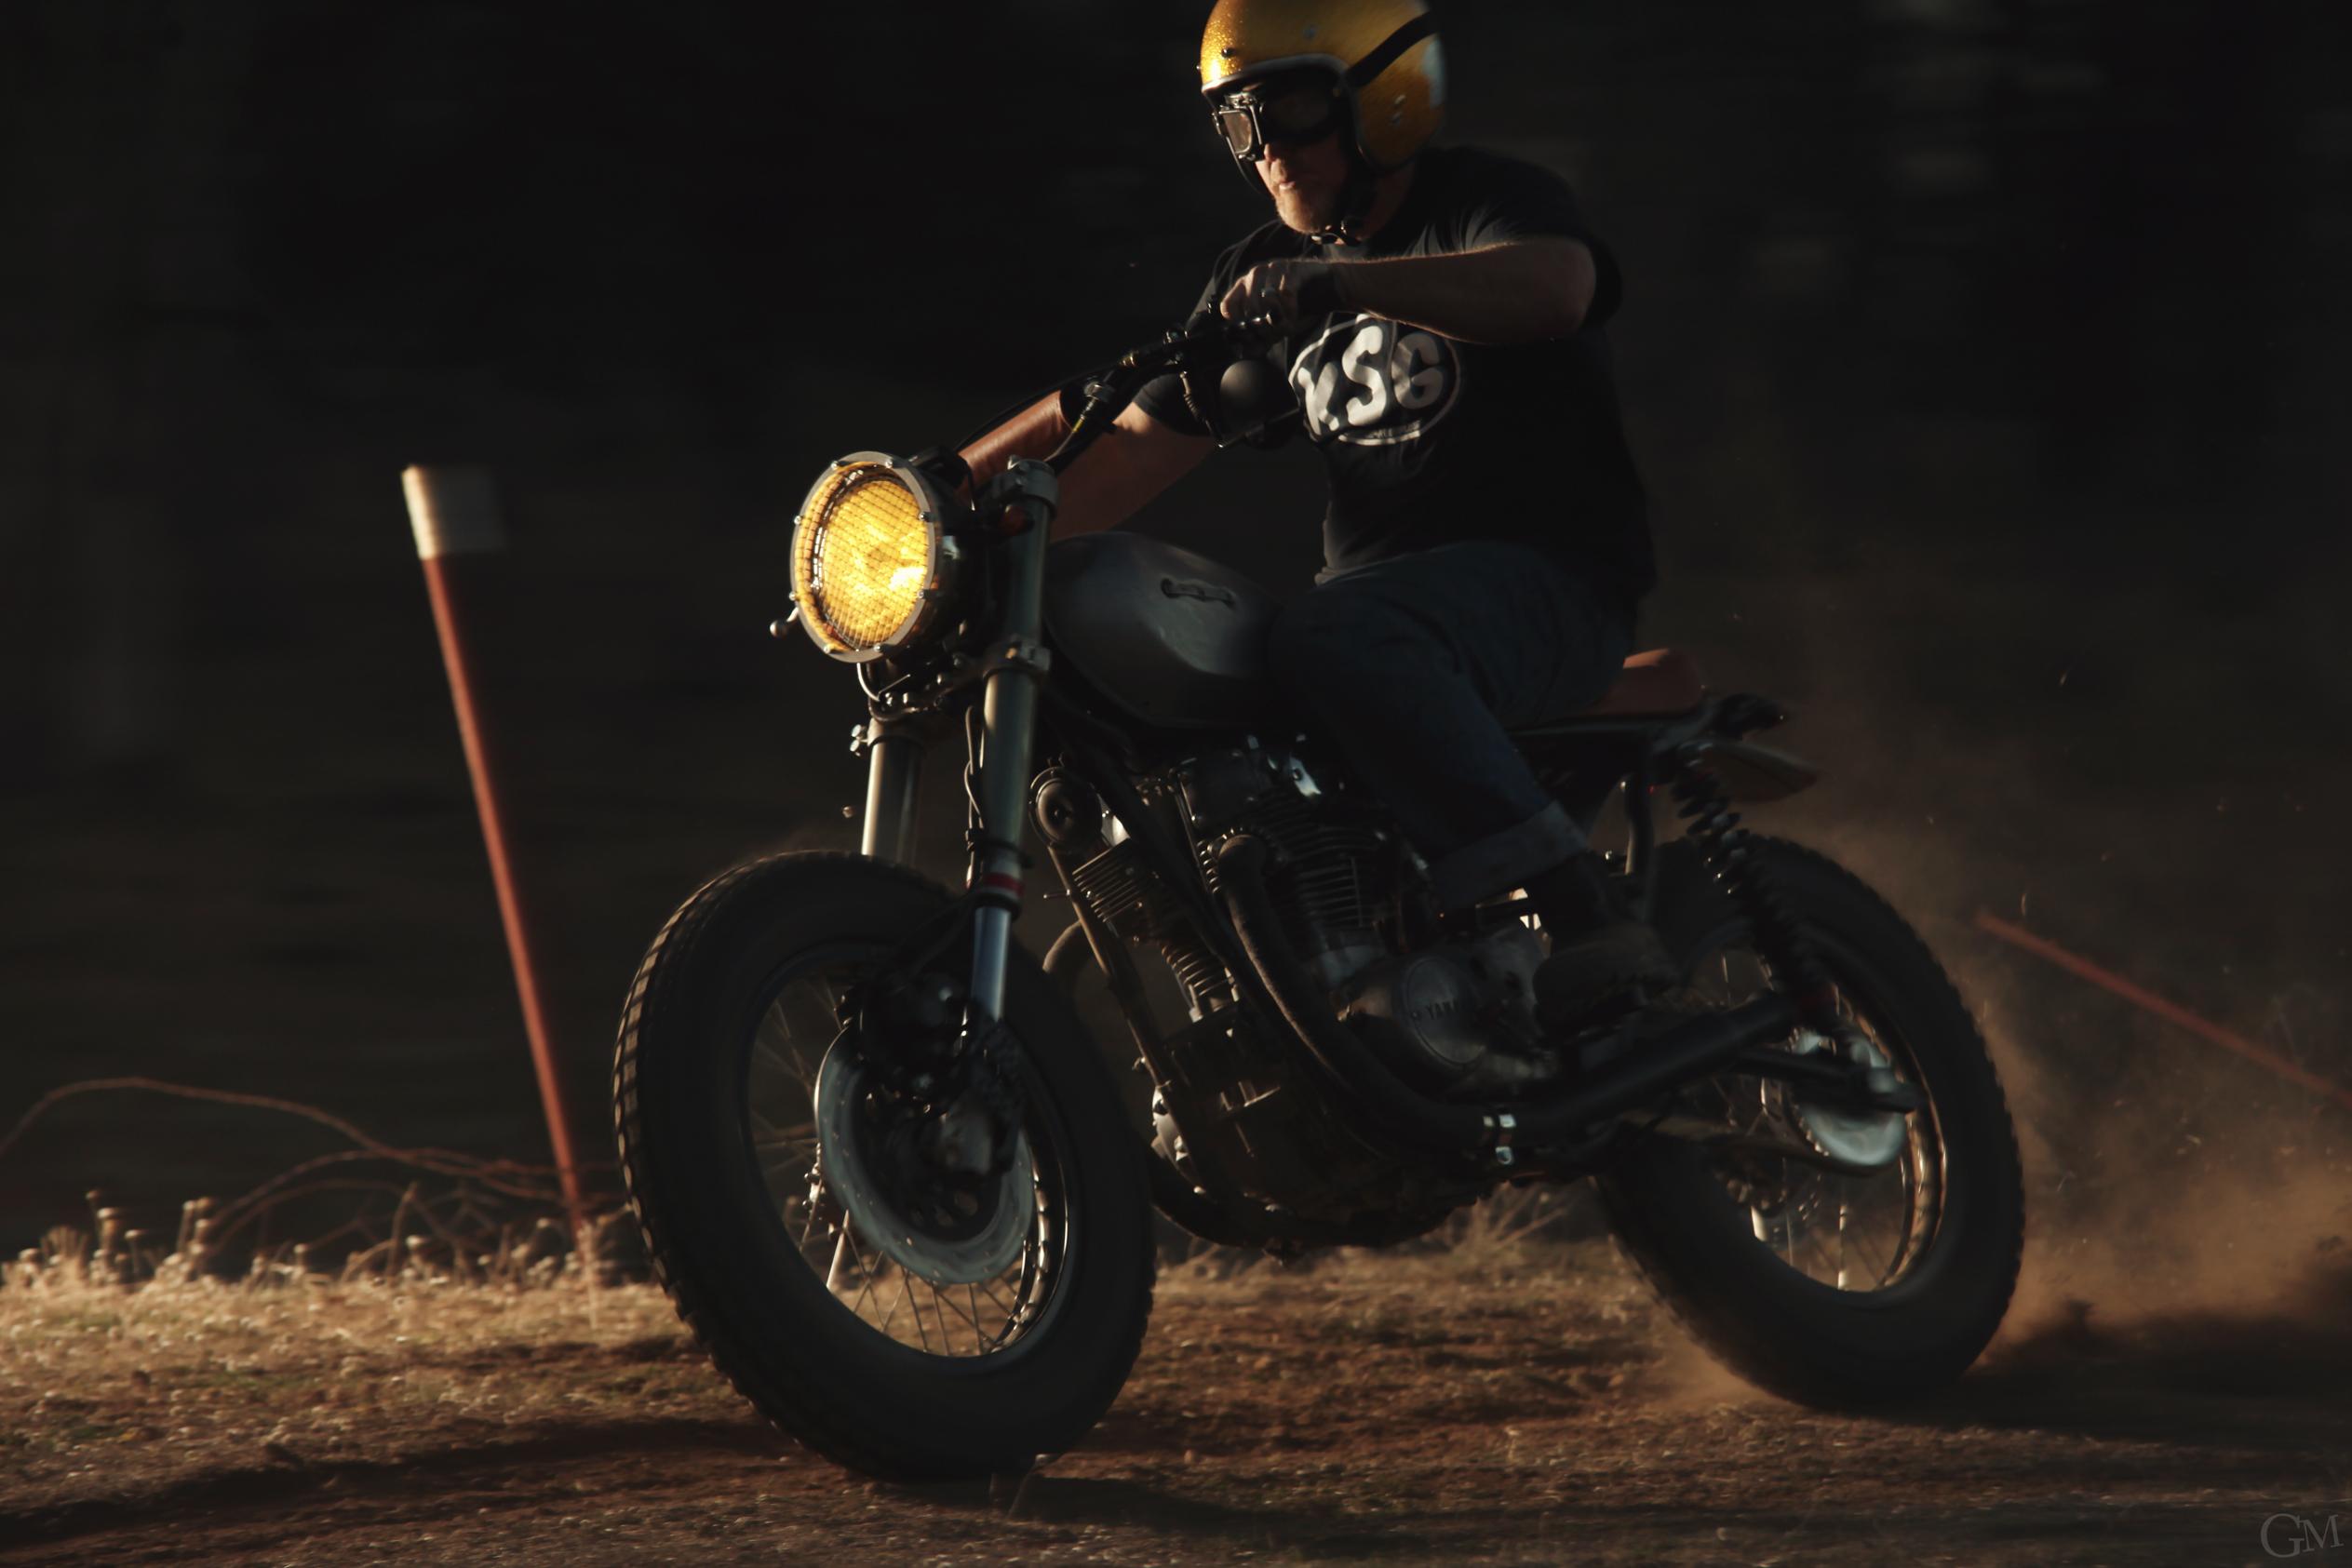 Wallpaper California Bike Photographer Garage Dirt